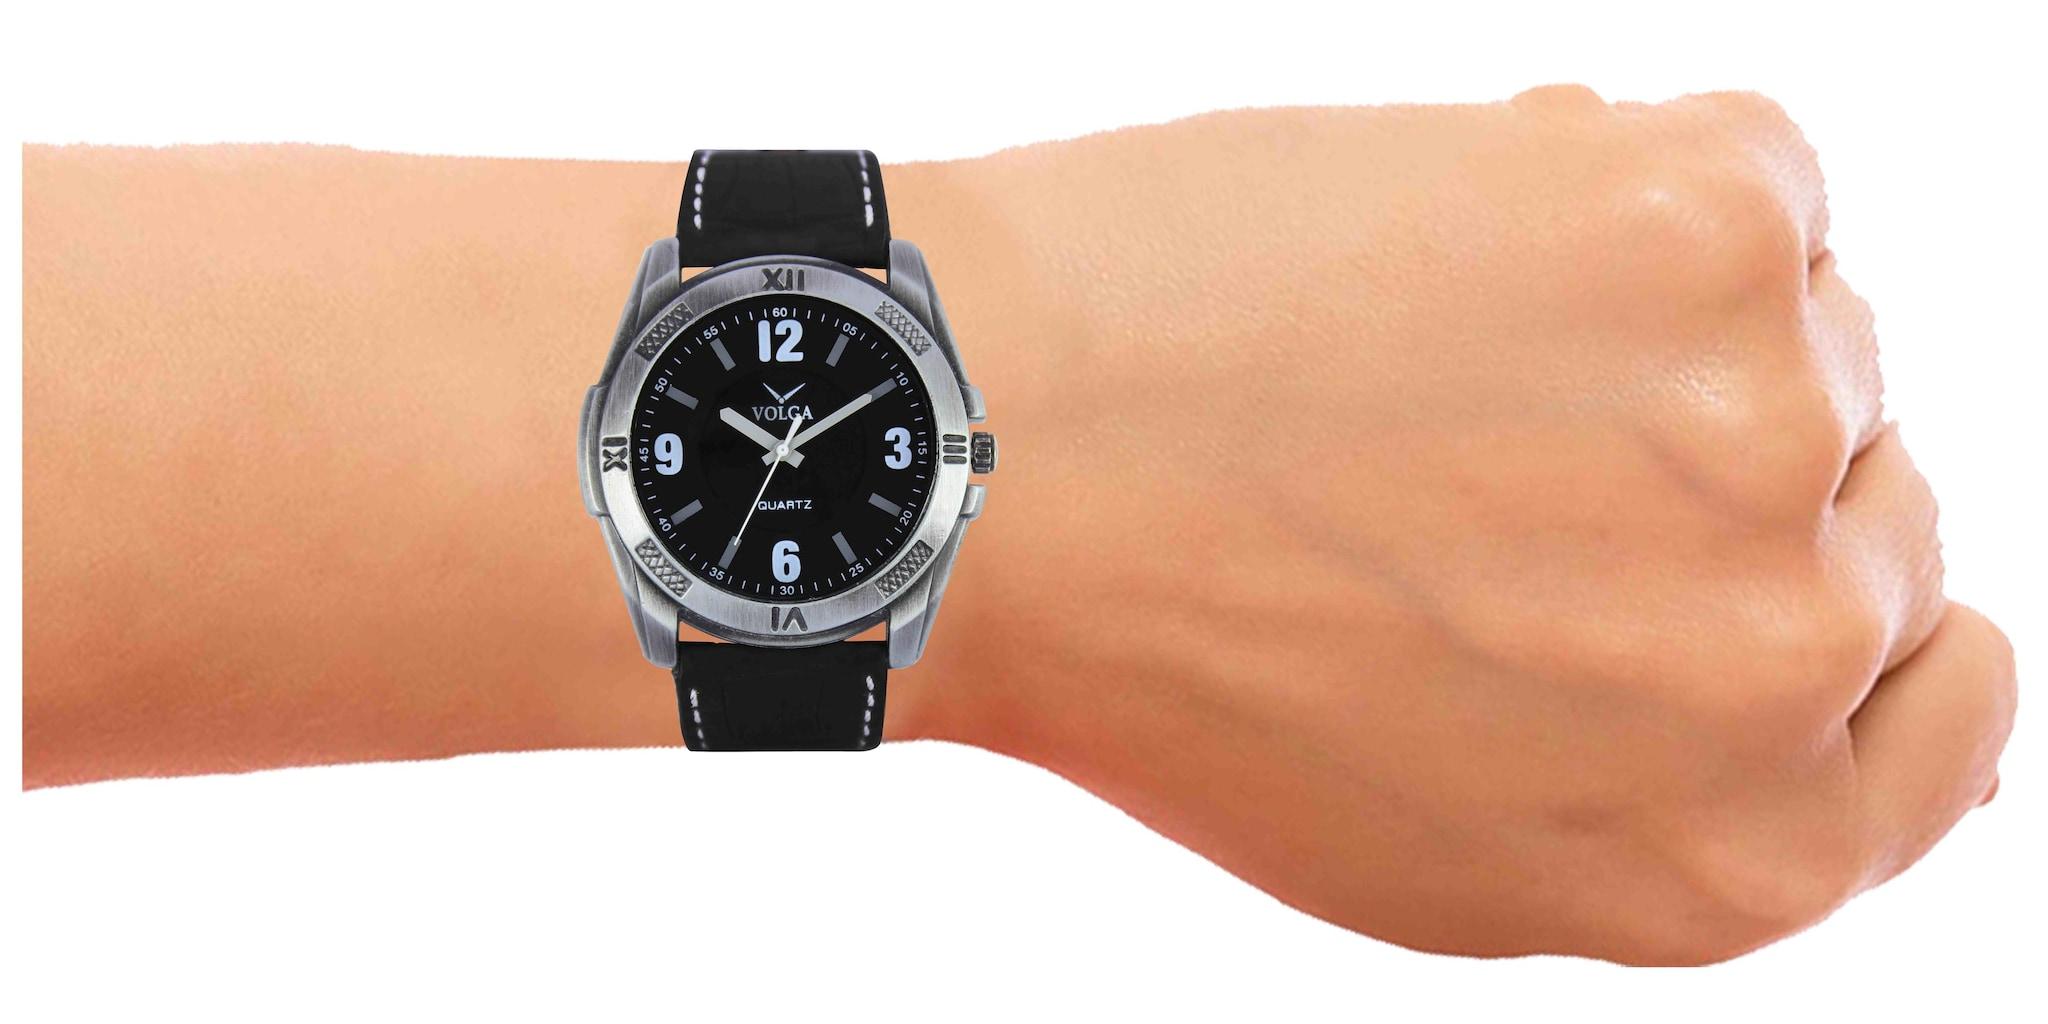 New Arrival Volga Analogue Black Dial Men's Designer Wrist  Watch